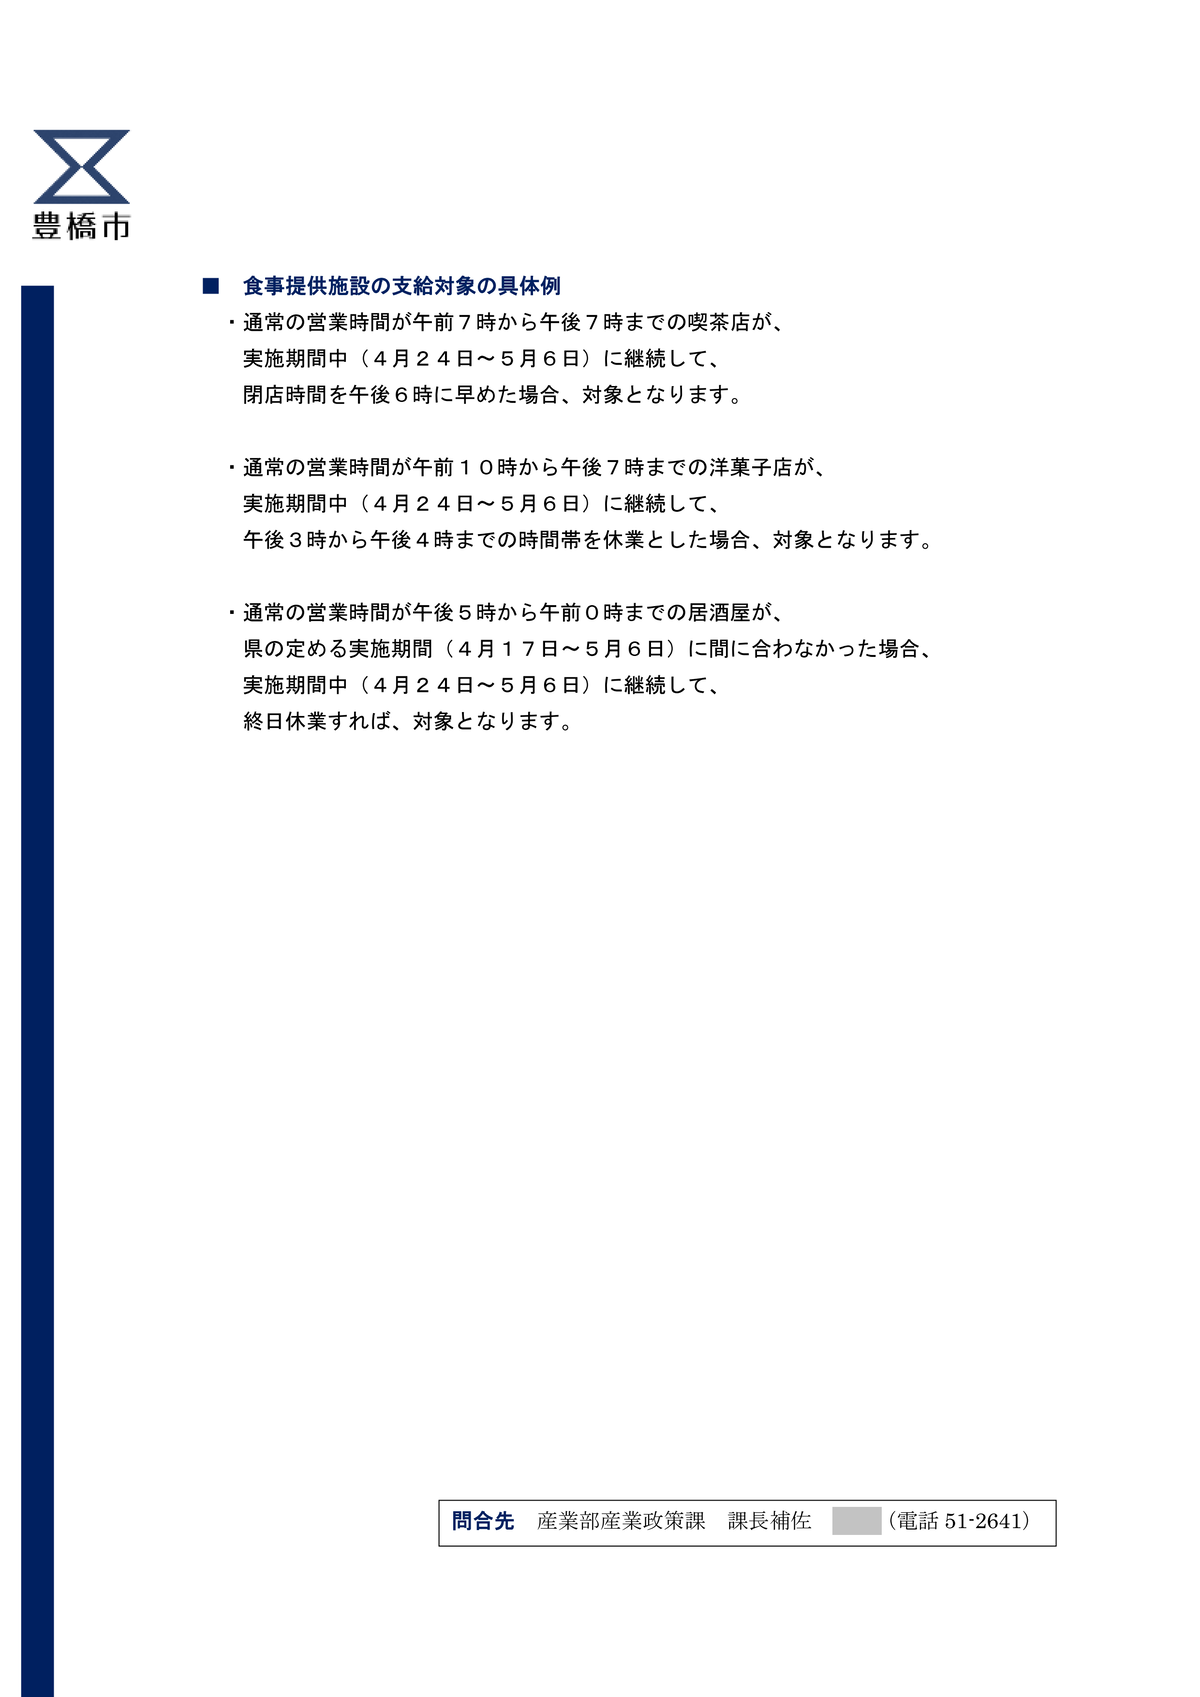 200422_R020422_03